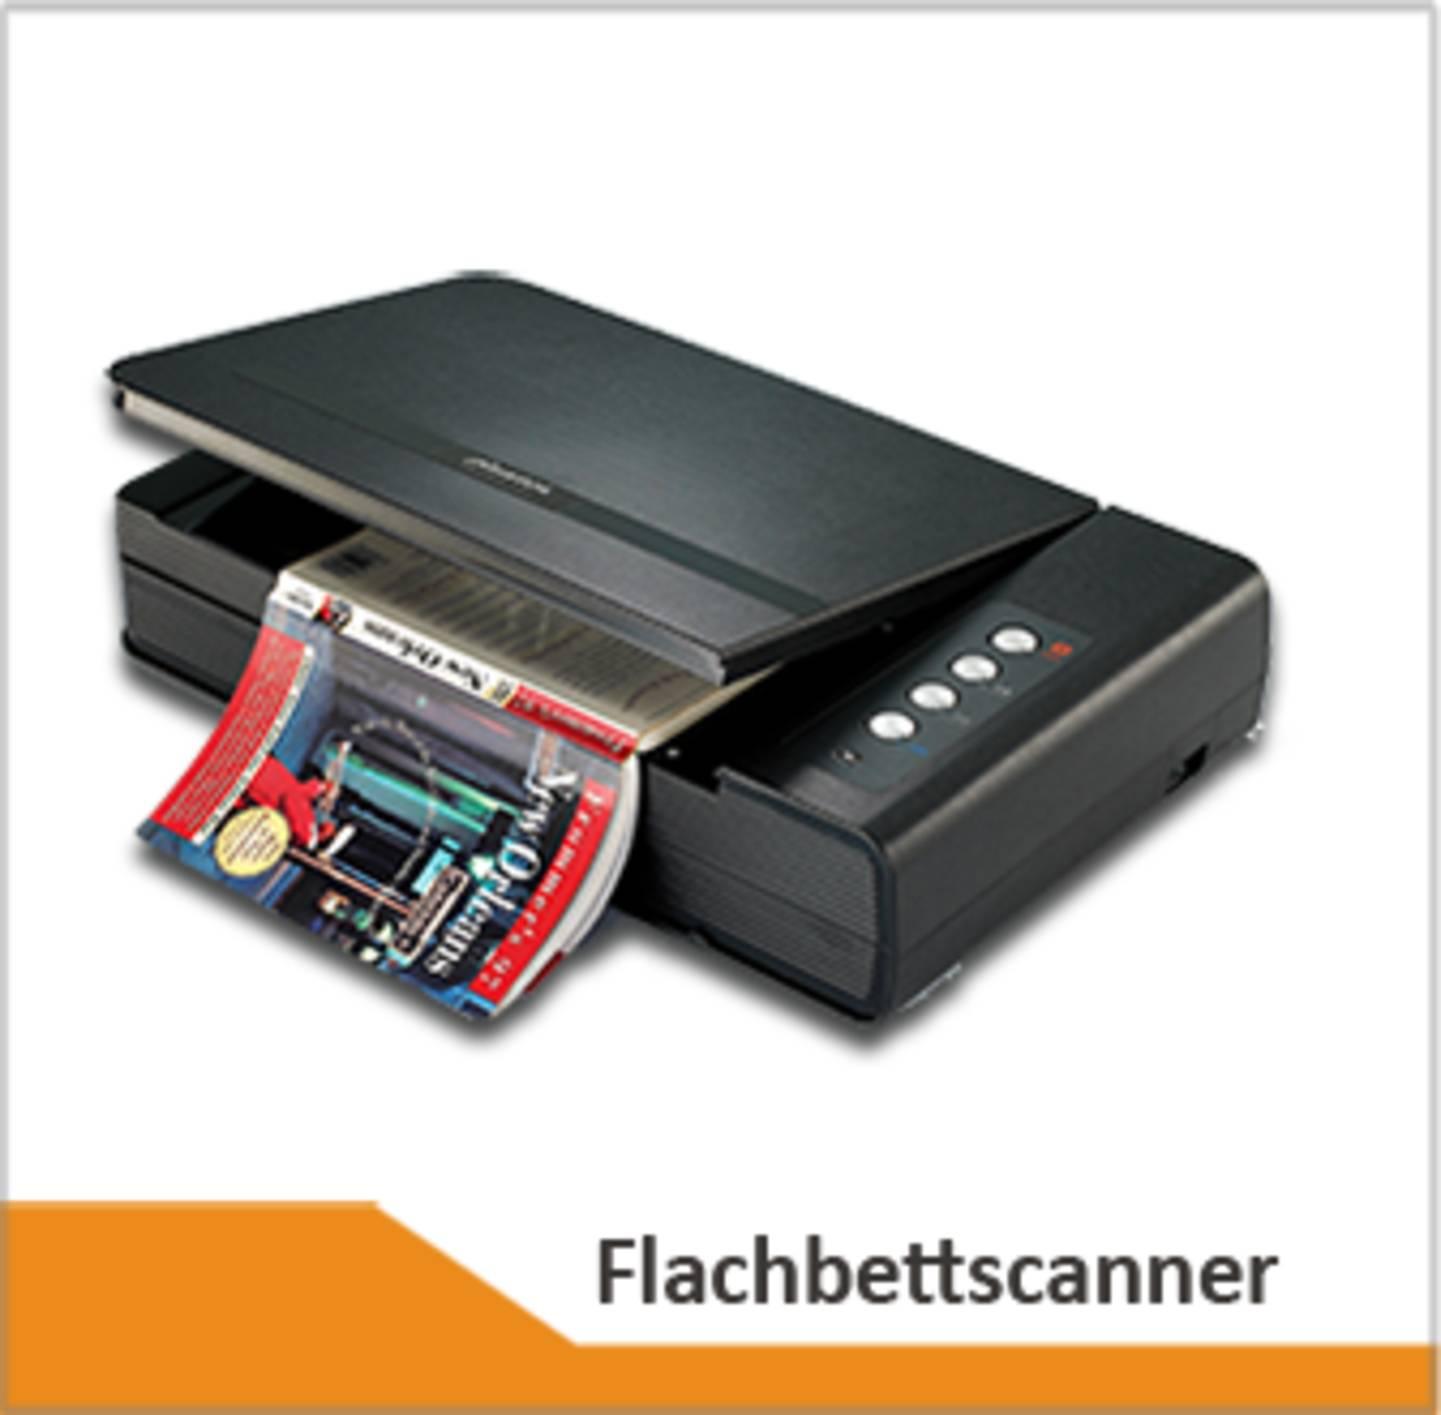 Flachbettscanner